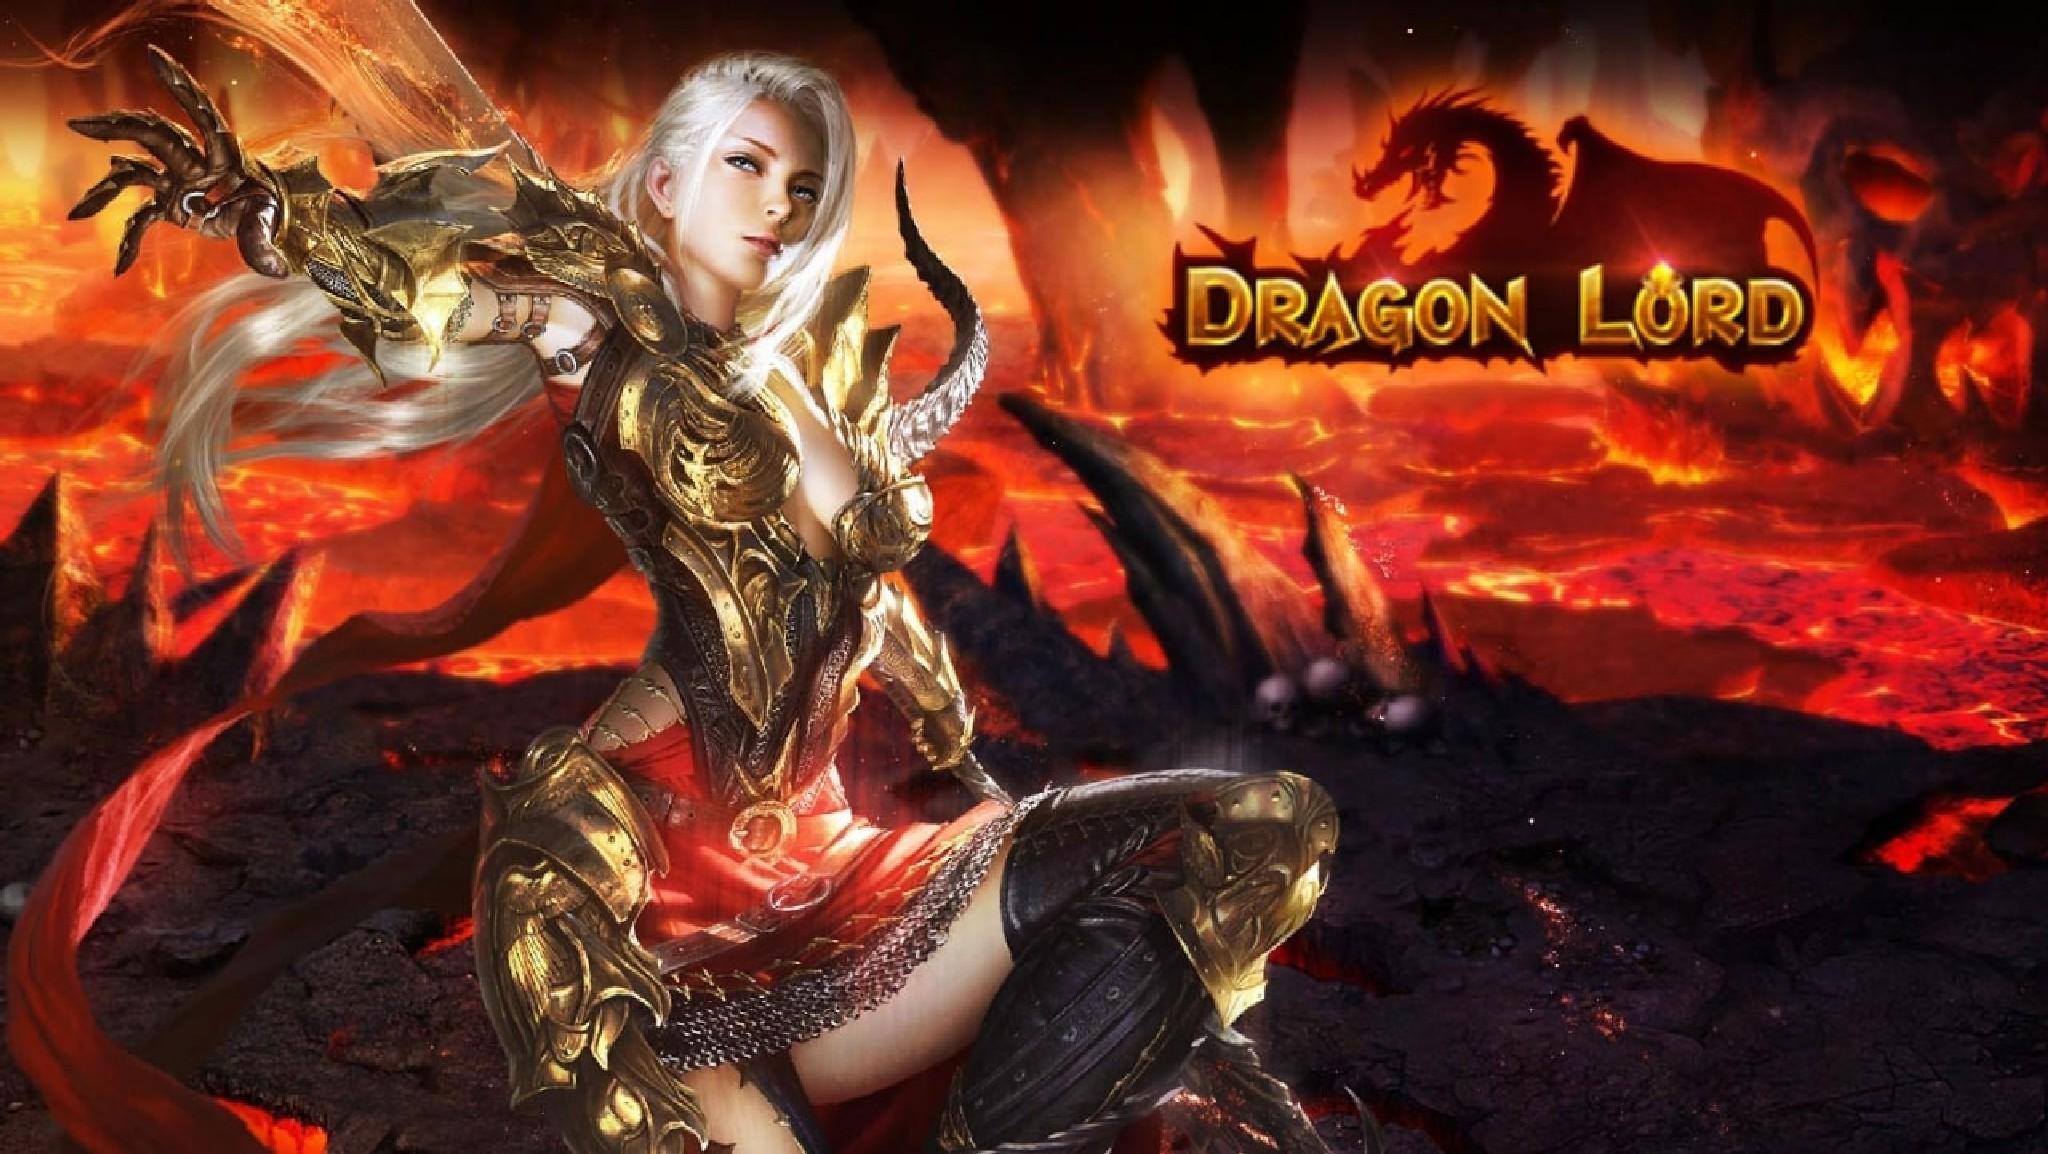 Играть Dragon Lord онлайн в браузере